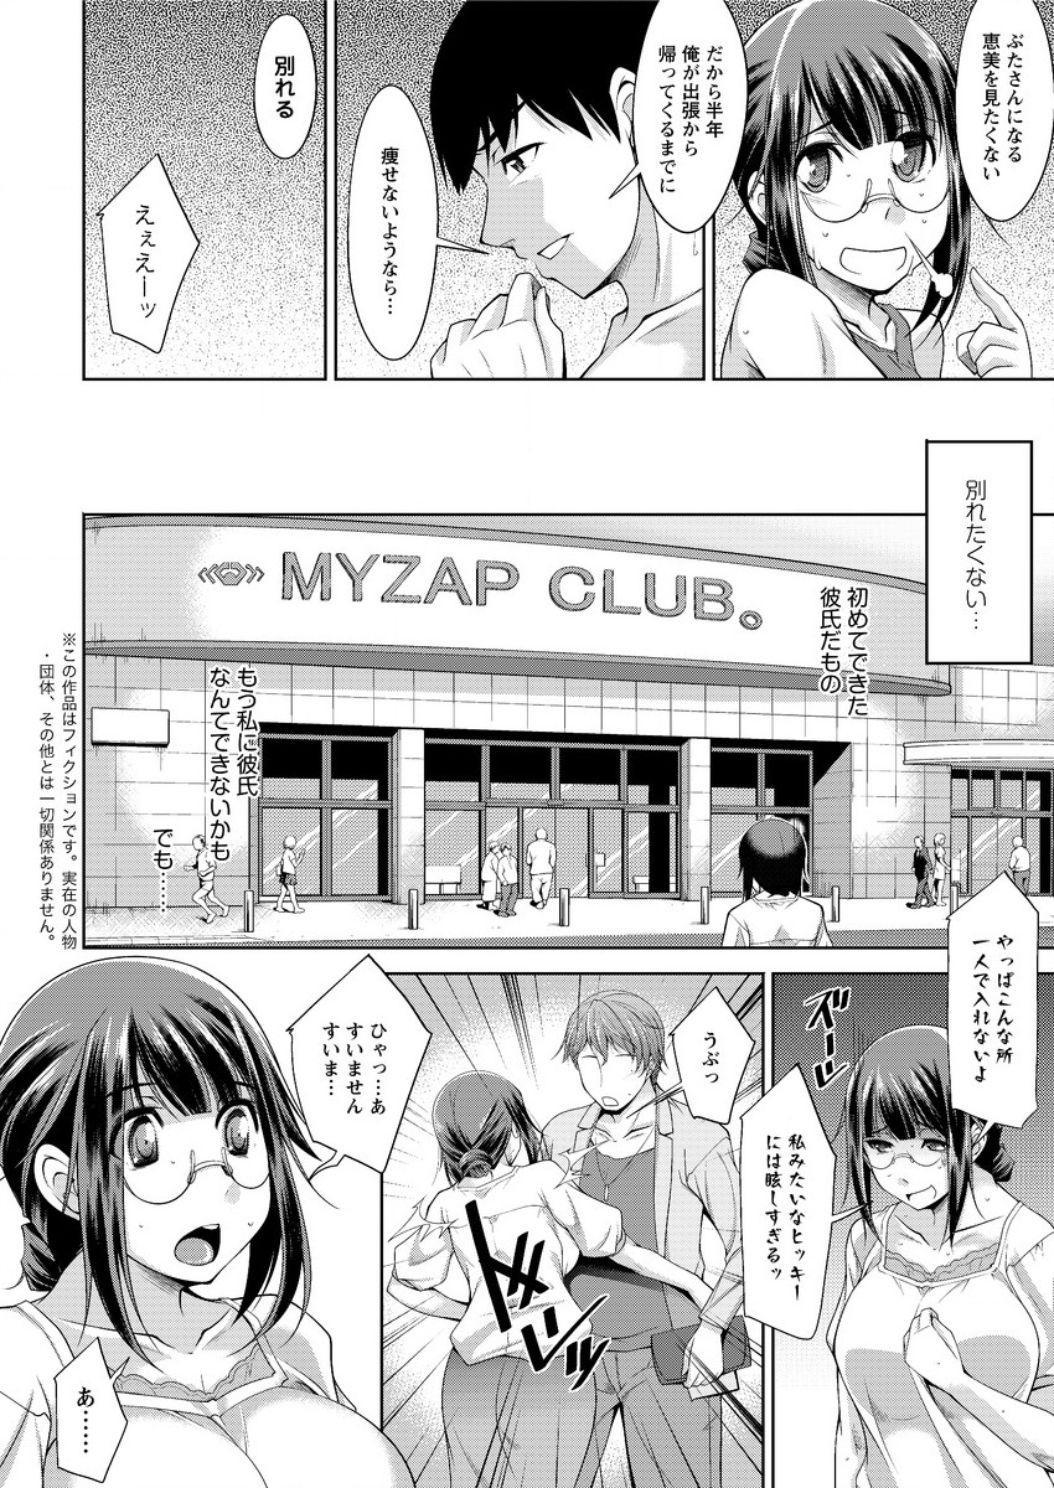 [zen9] Yacchae! Megumi-san | Do it! Megumi-san Ch 1-6 5